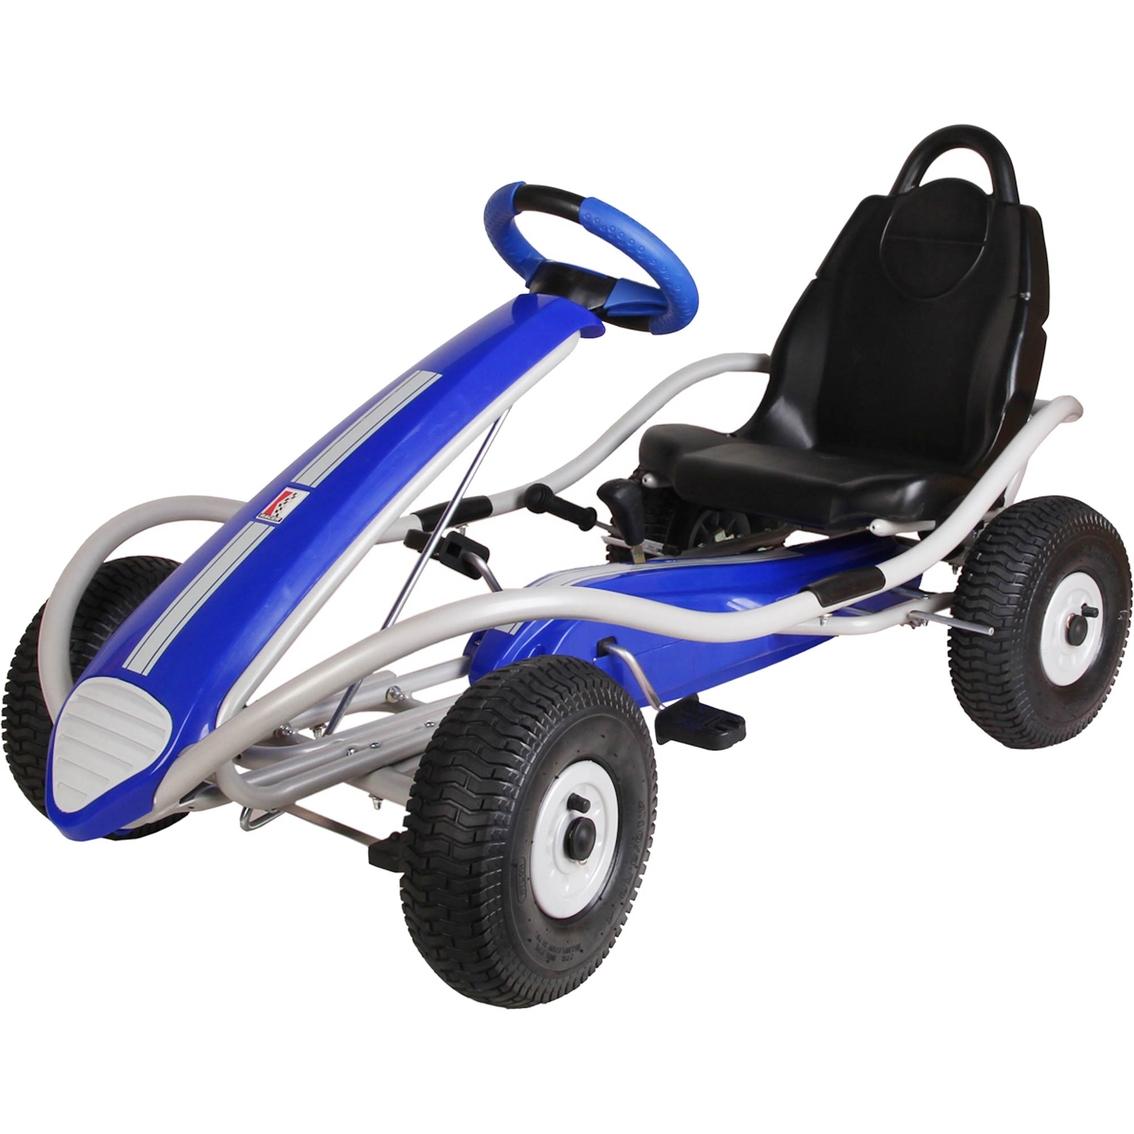 kettler dakar racer s pedal car pedal push baby. Black Bedroom Furniture Sets. Home Design Ideas